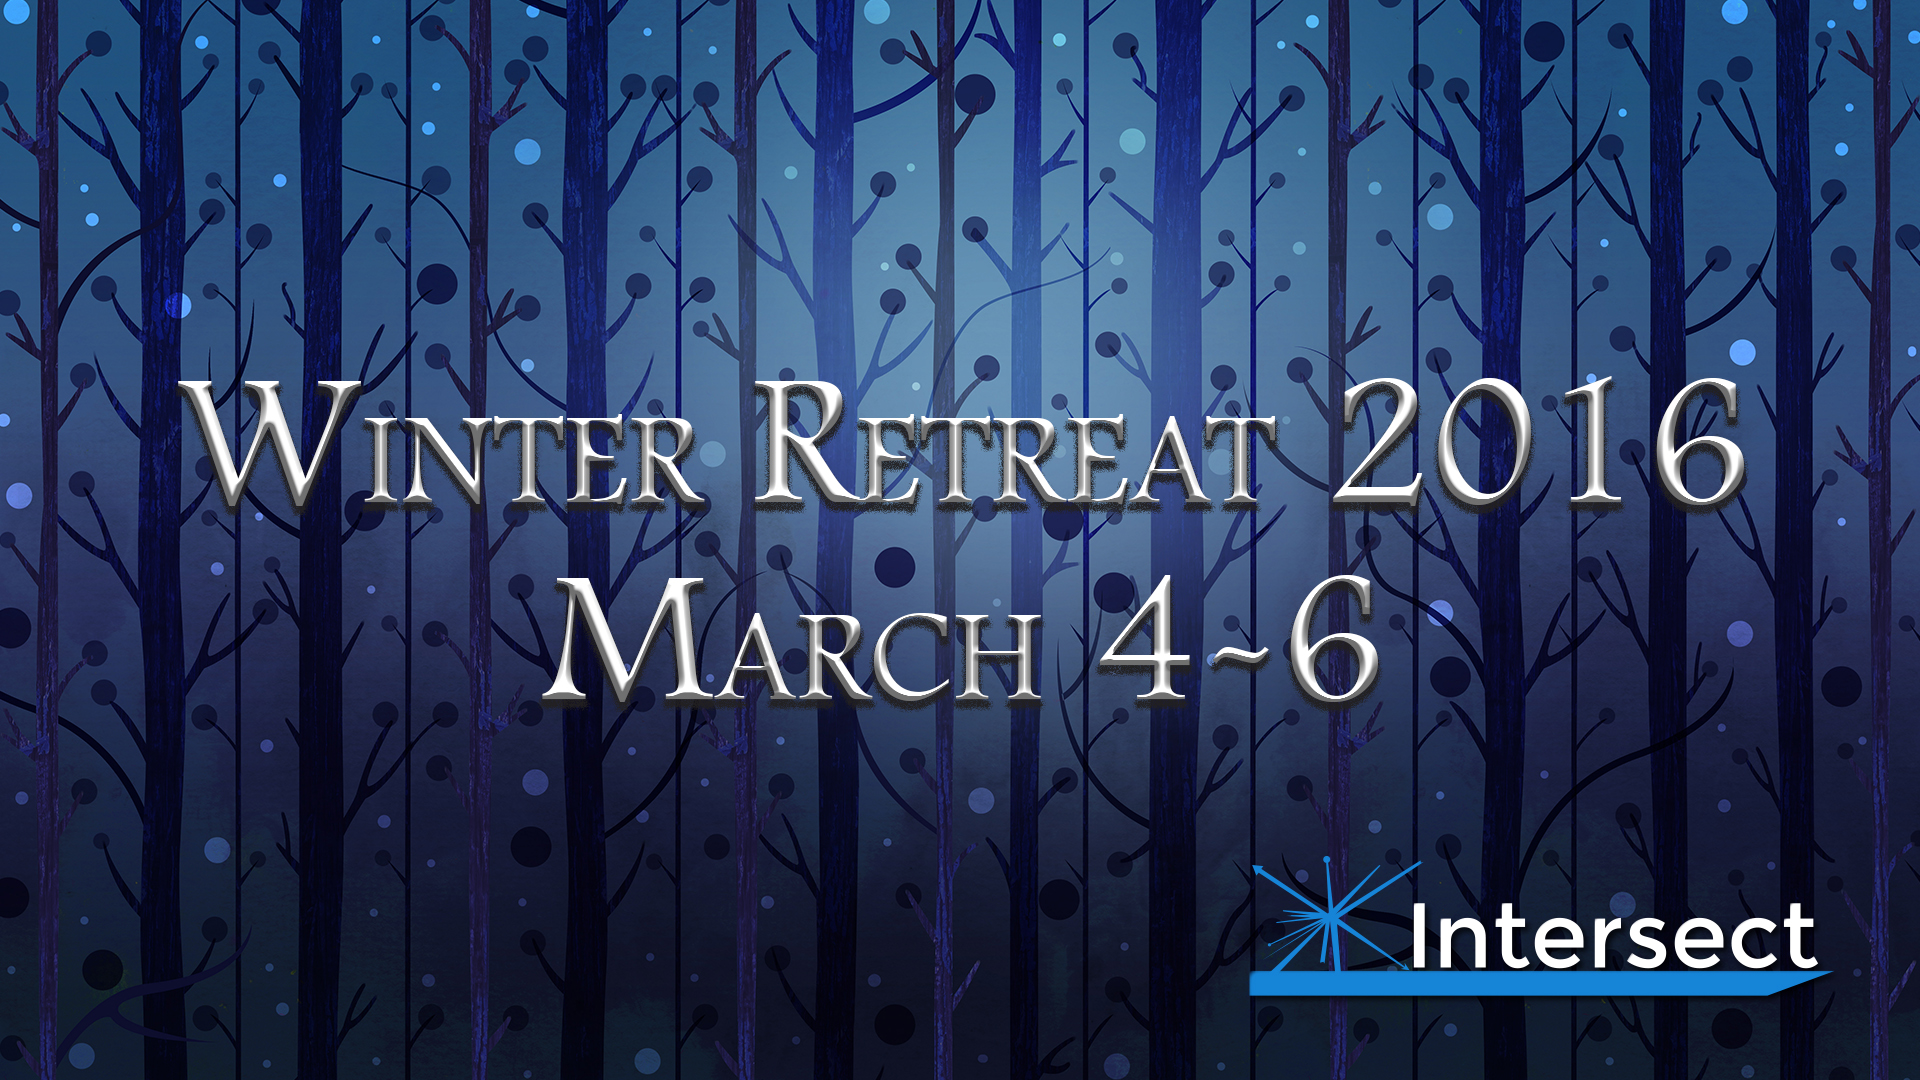 Winter retreat 2016  no costs